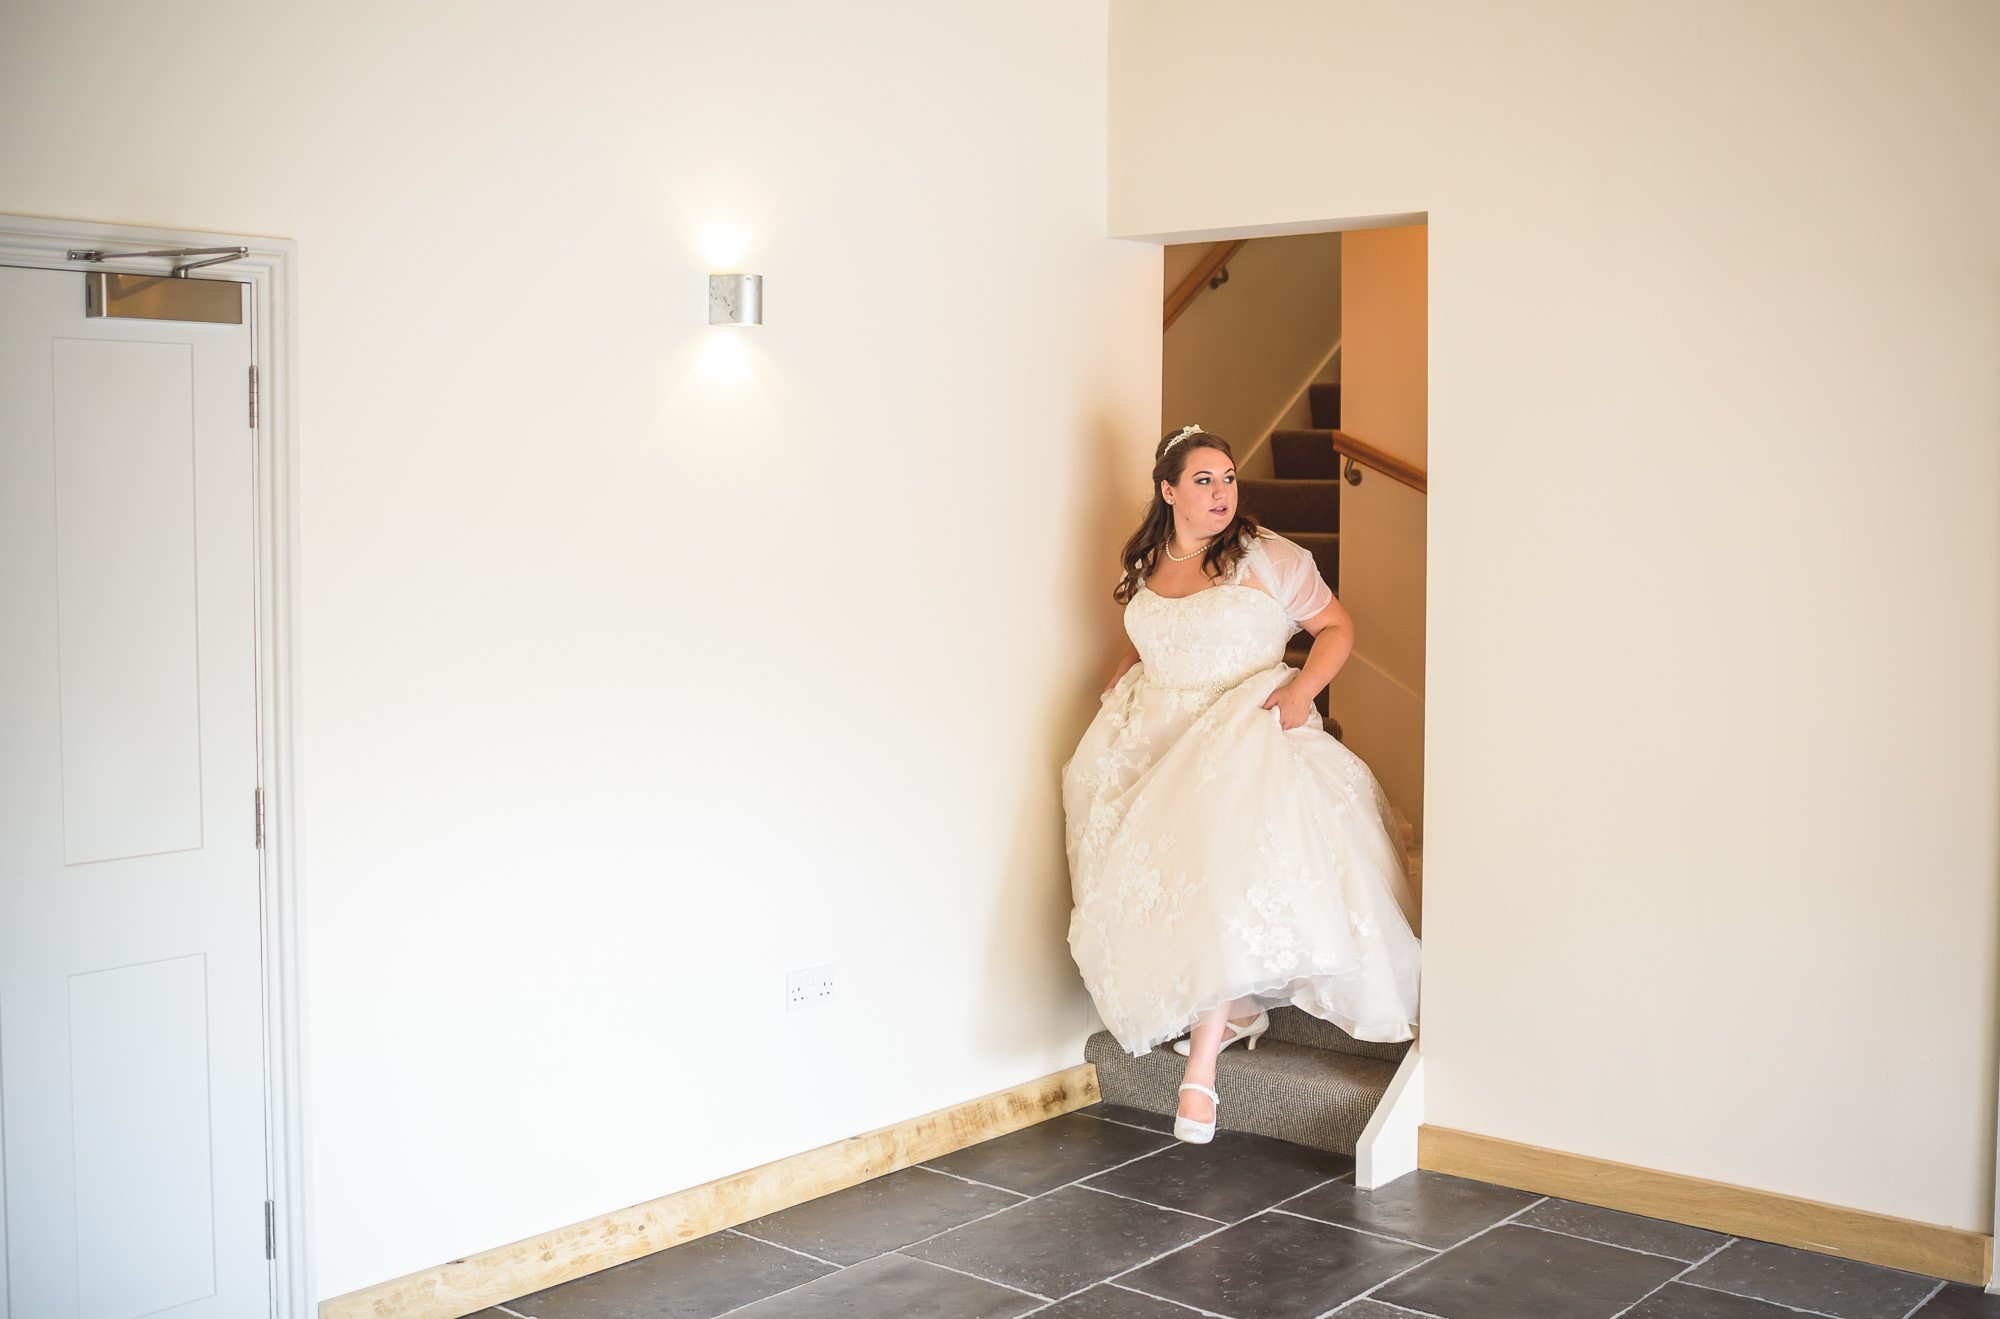 Lauren-and-Lee-Millbridge-Court-wedding-photography-56-of-166